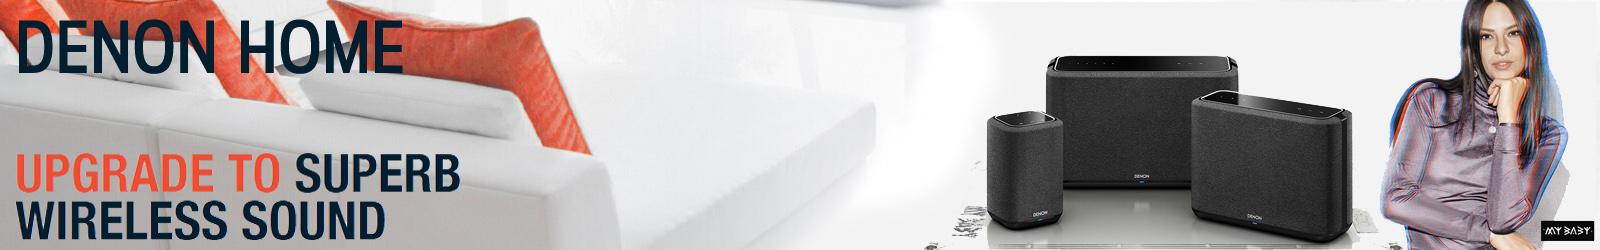 Denon Home Wireless Speakers Banner